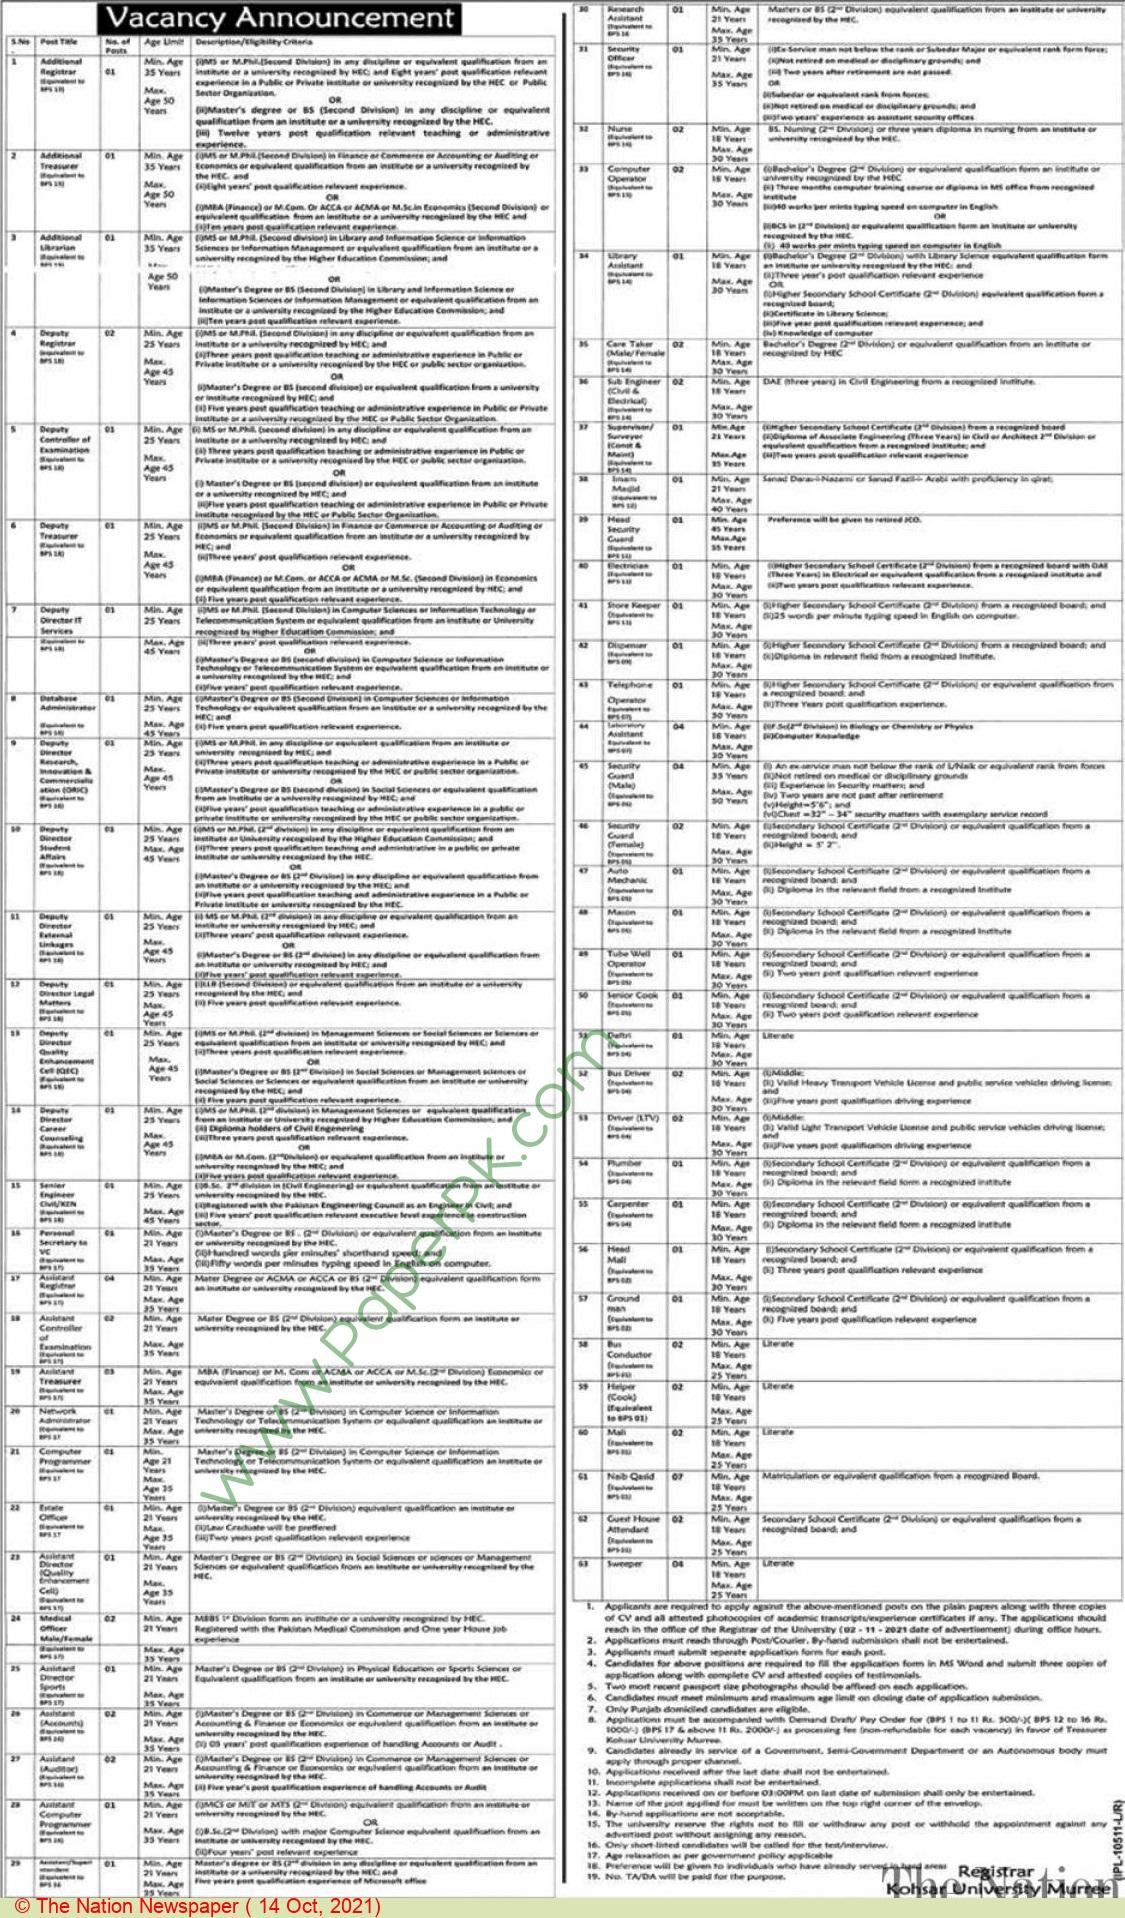 Kohsar University jobs newspaper ad for Databas Administrator in Murree on 2021-10-14